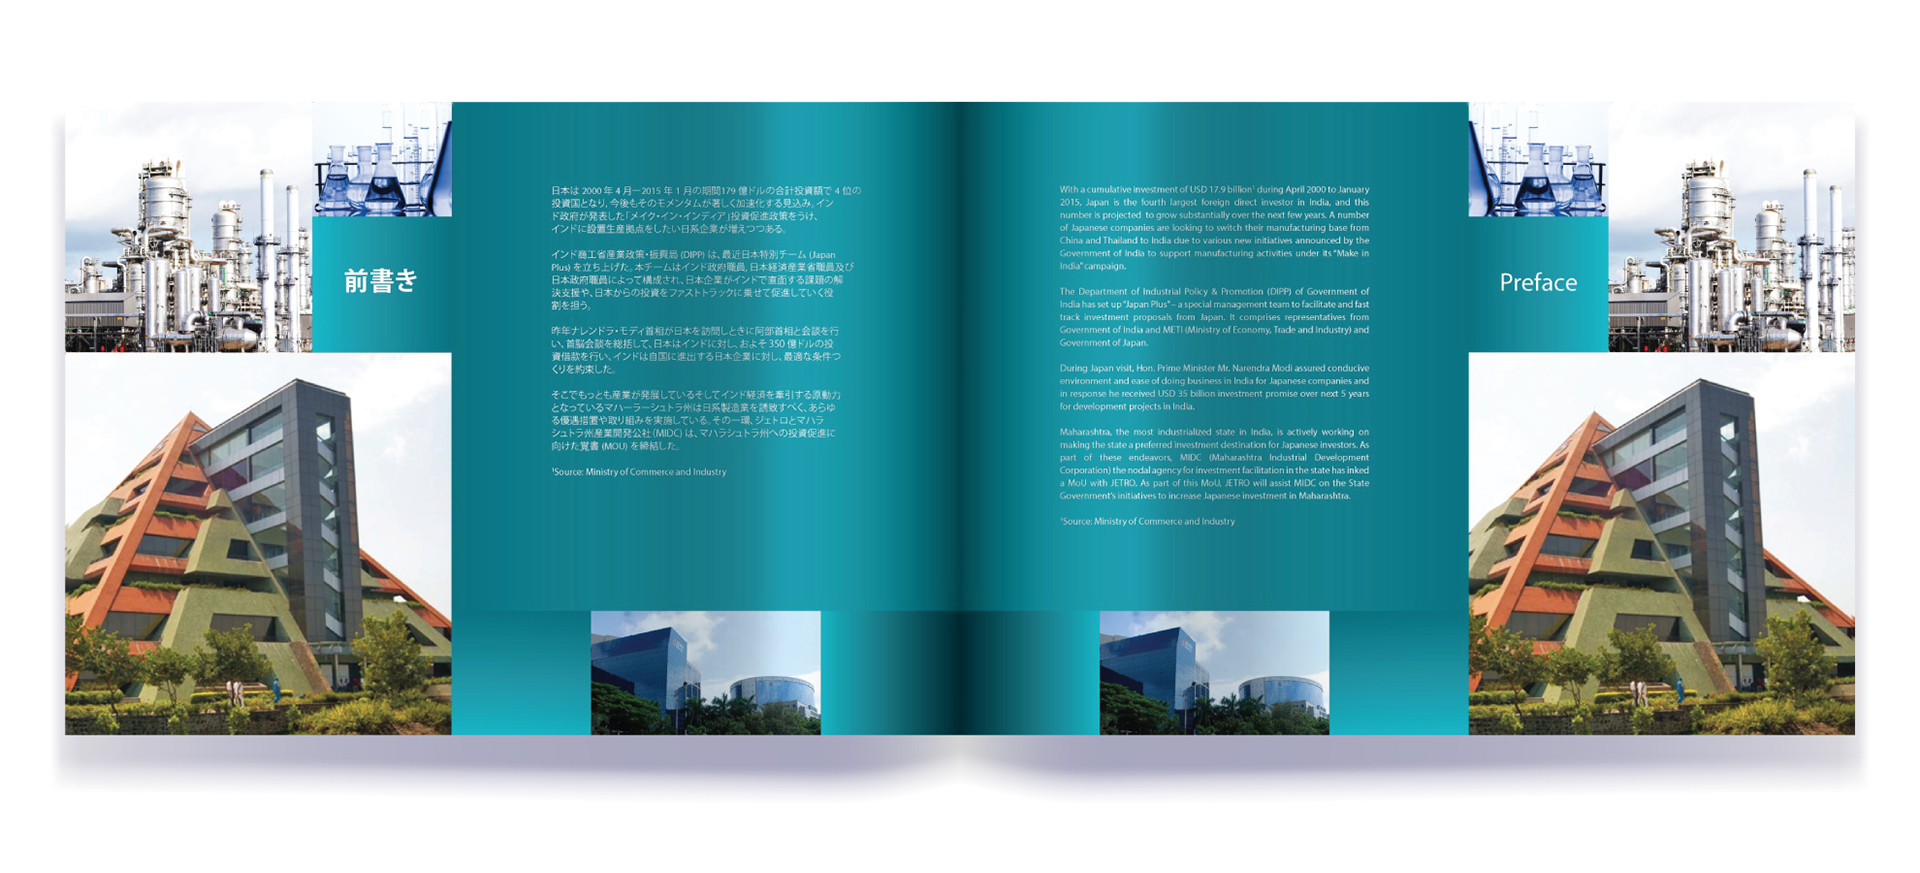 MIDC-SUPA Japanese Industrial Zone Brochure on Behance